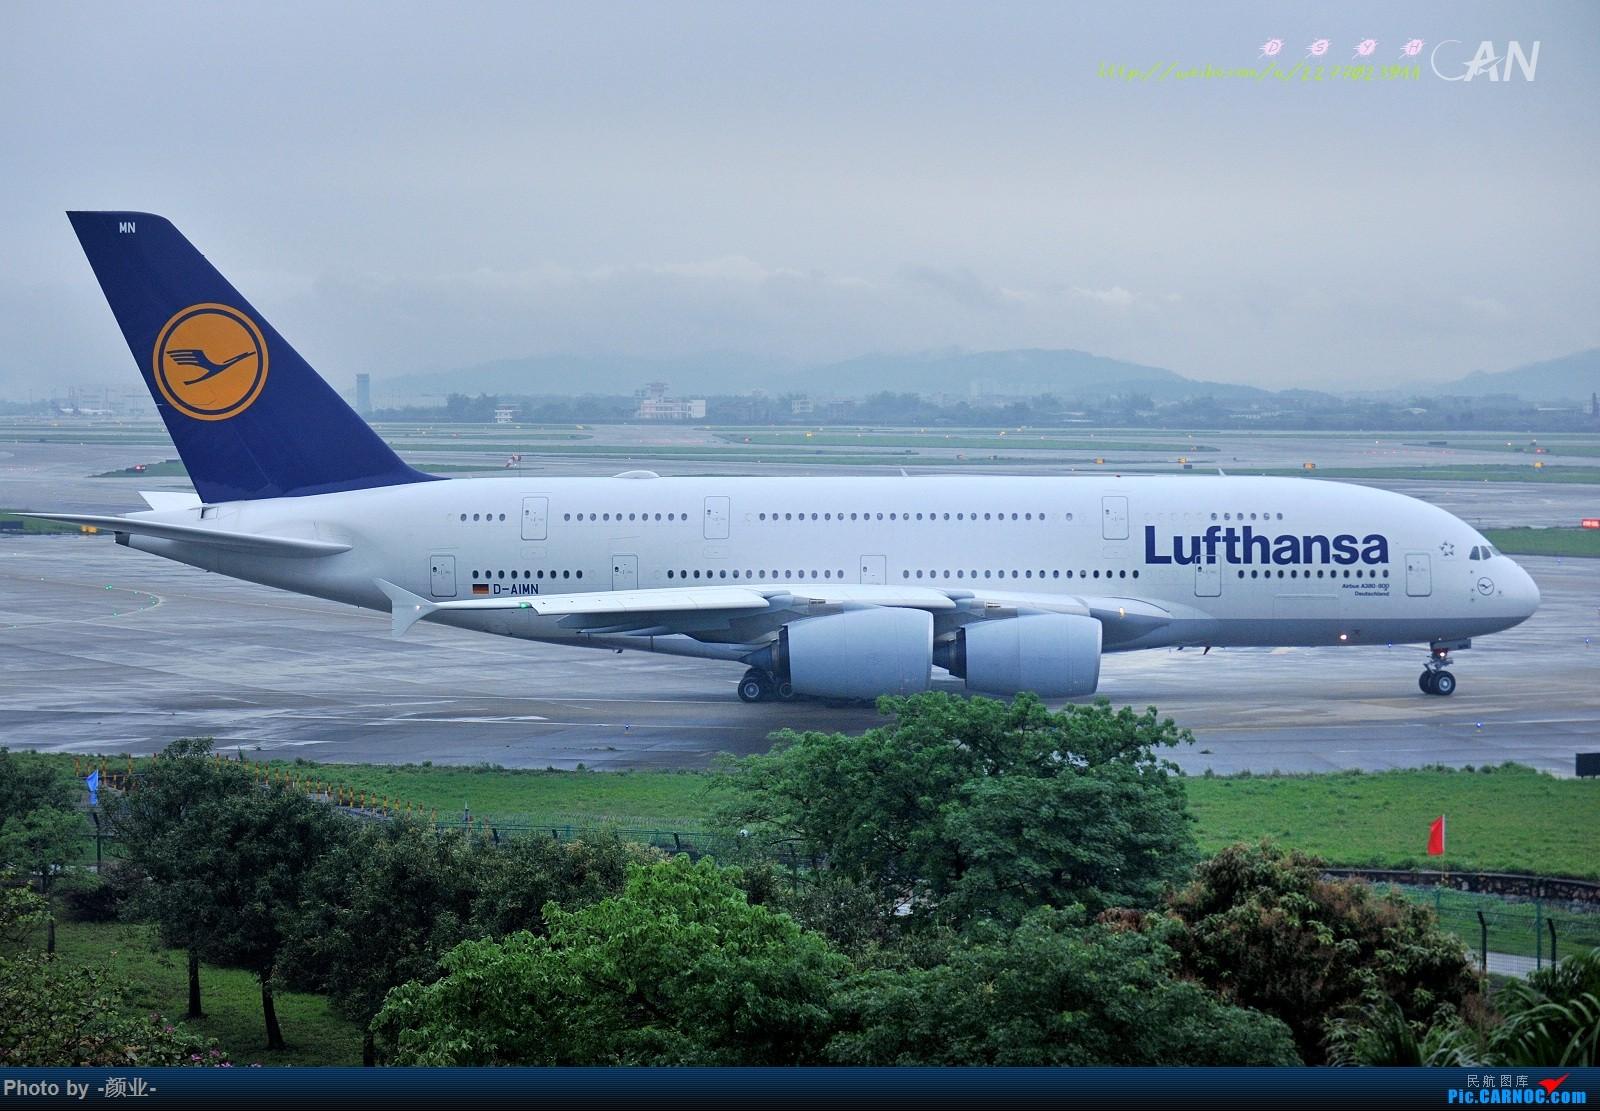 Re:[原创]2011-2016我的打灰机心情[广州] AIRBUS A380-800 D-AIMN 中国广州白云国际机场